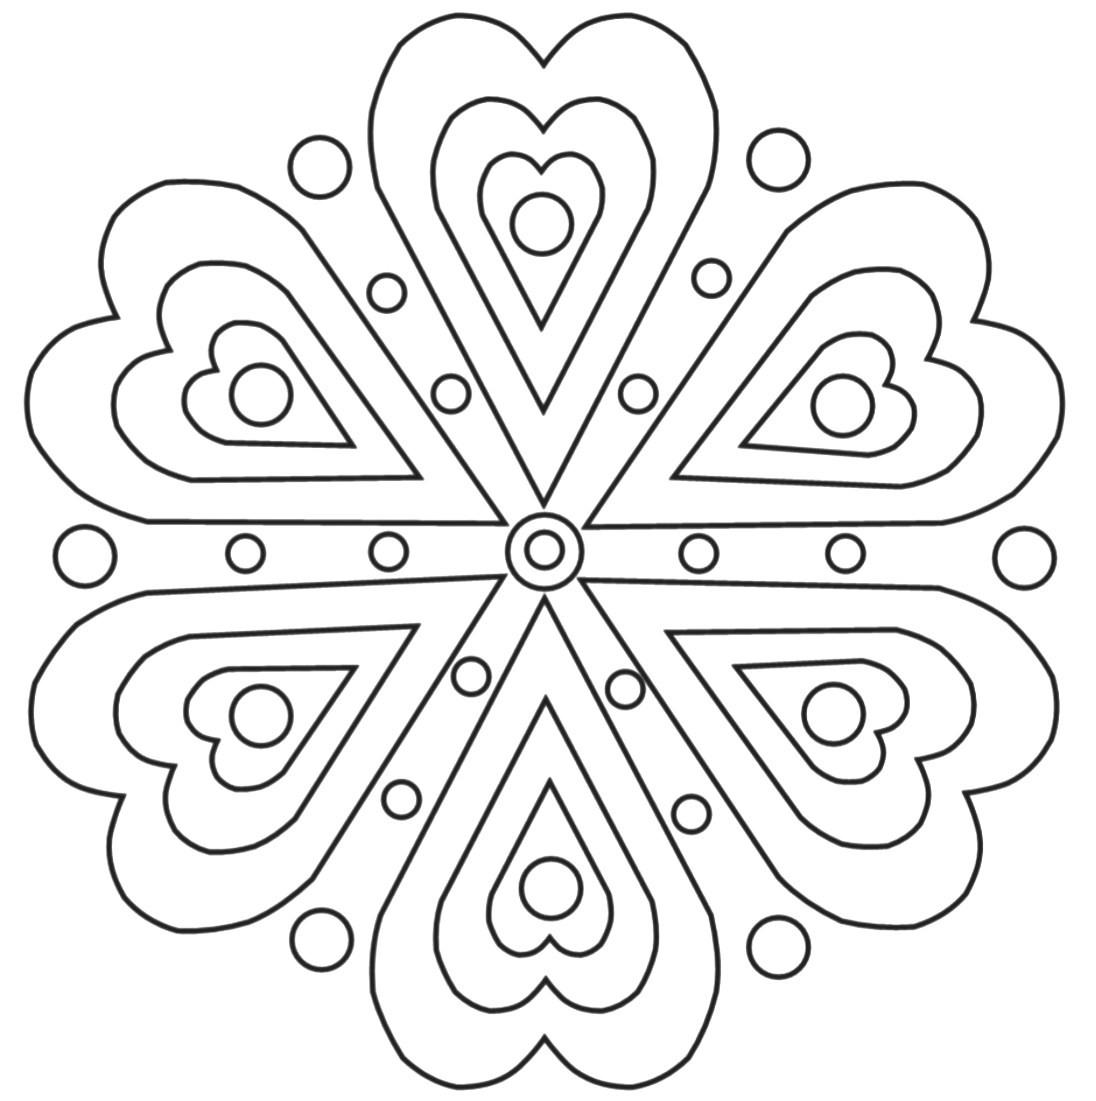 Ausmalbilder Mandala 19